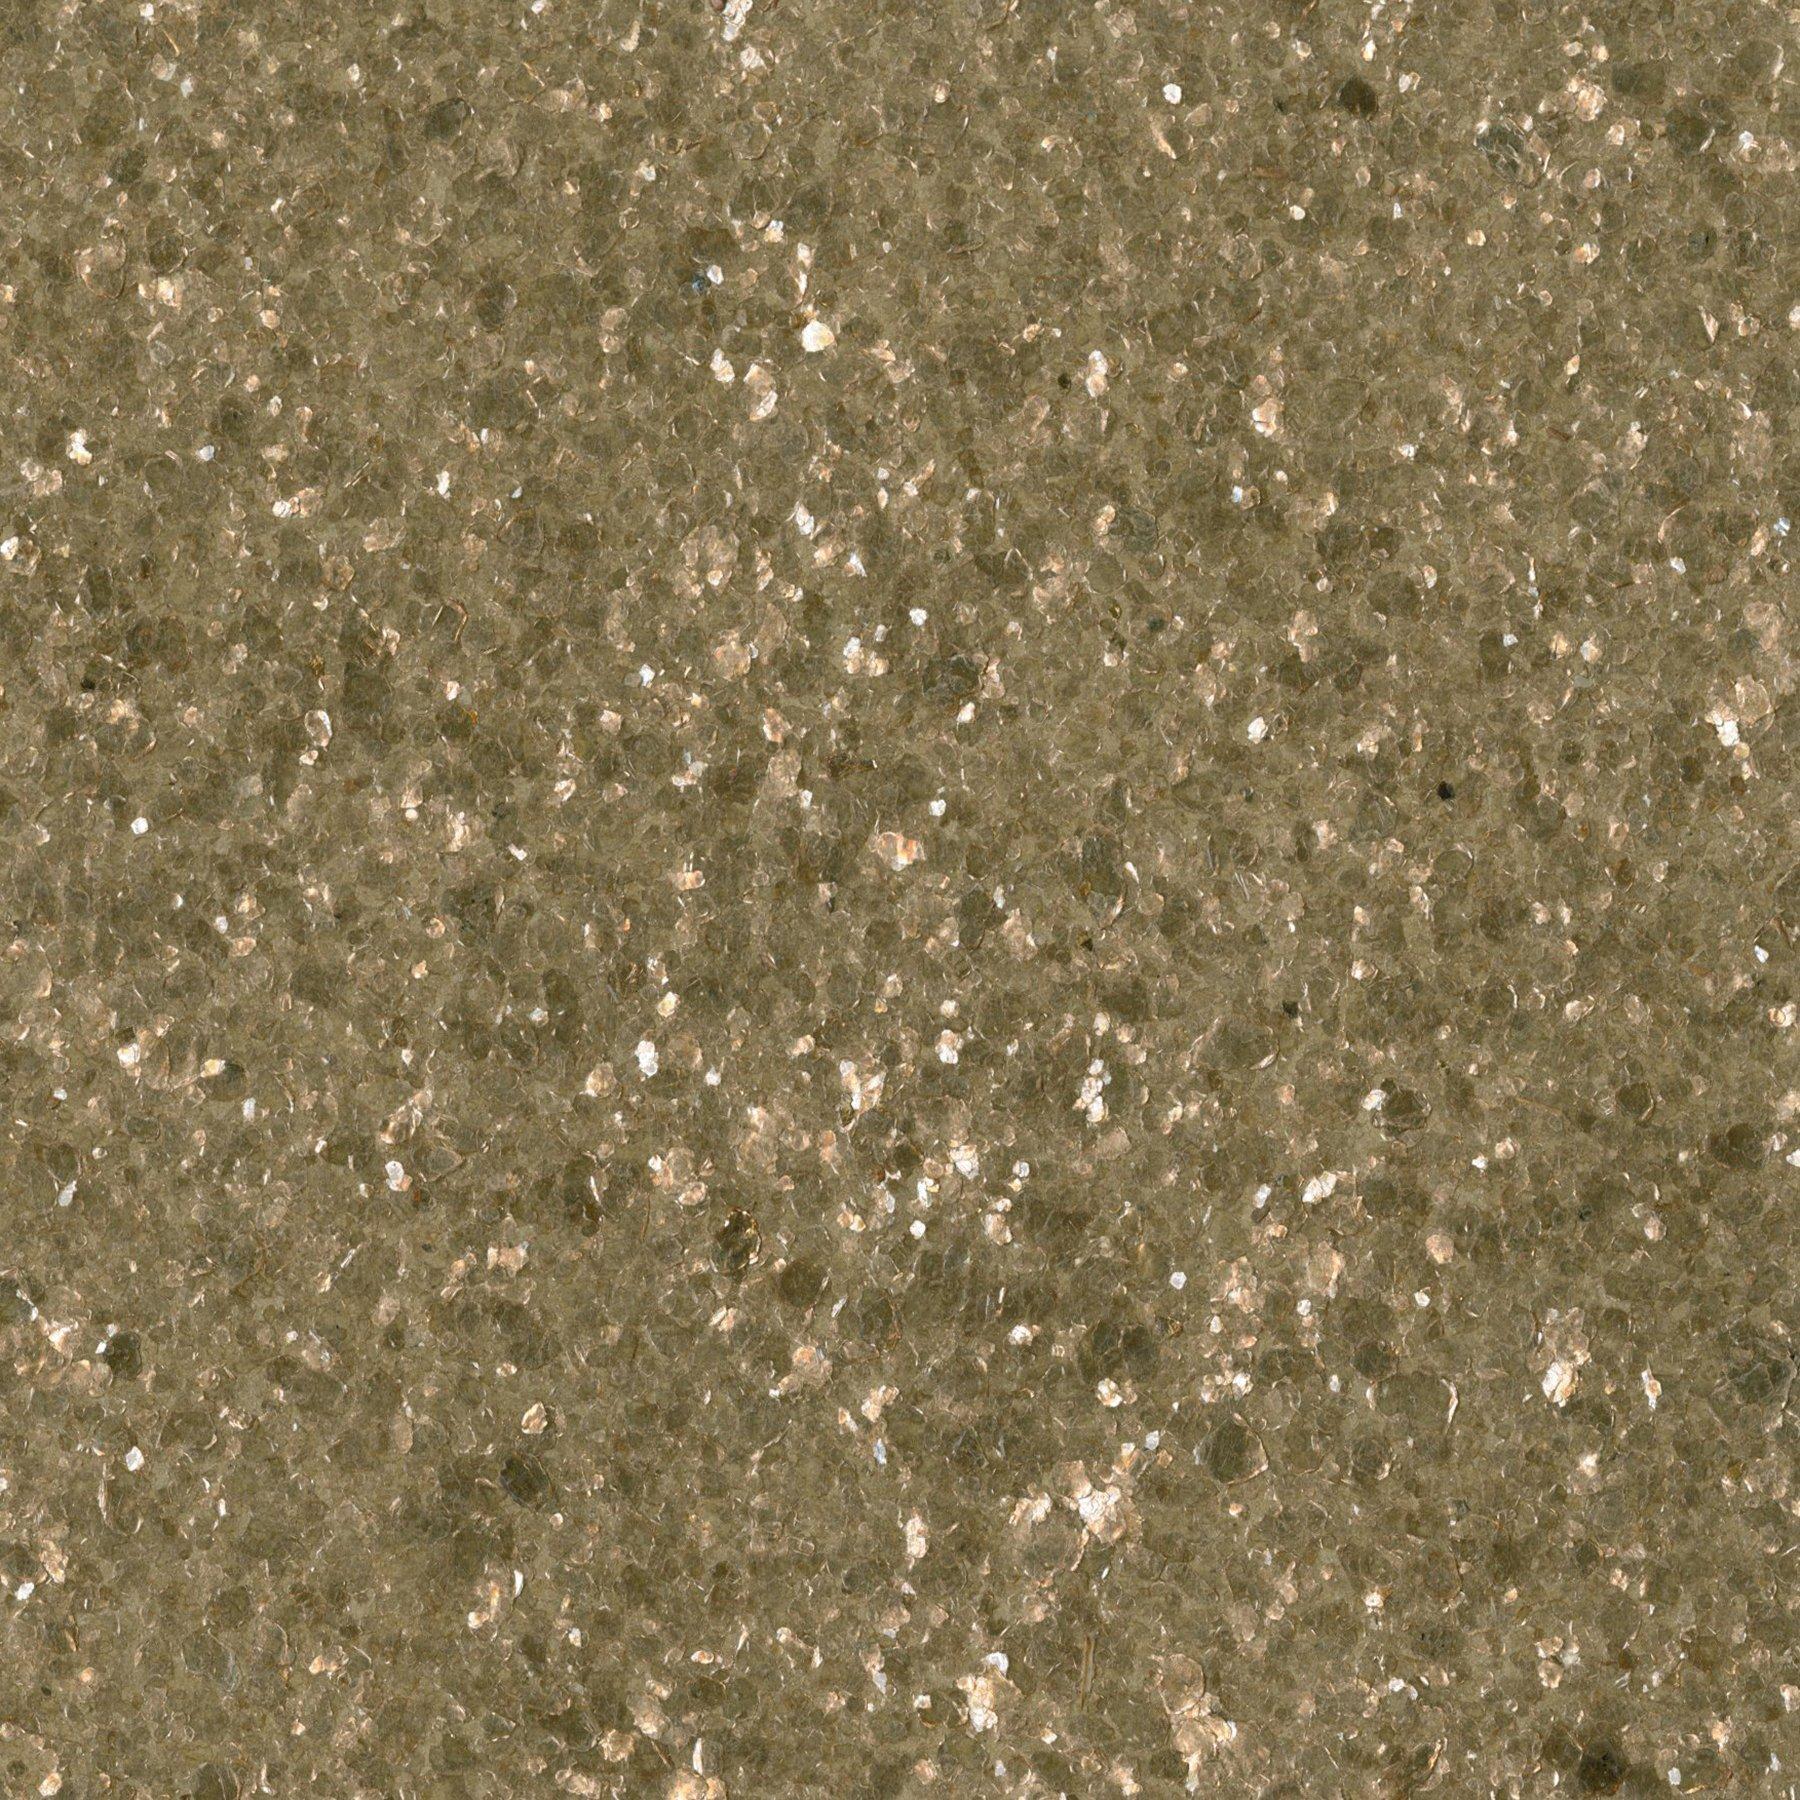 Kenxb|#Kenneth James 2693-30244 Soko Bronze Mica Wallpaper, by Kenneth James